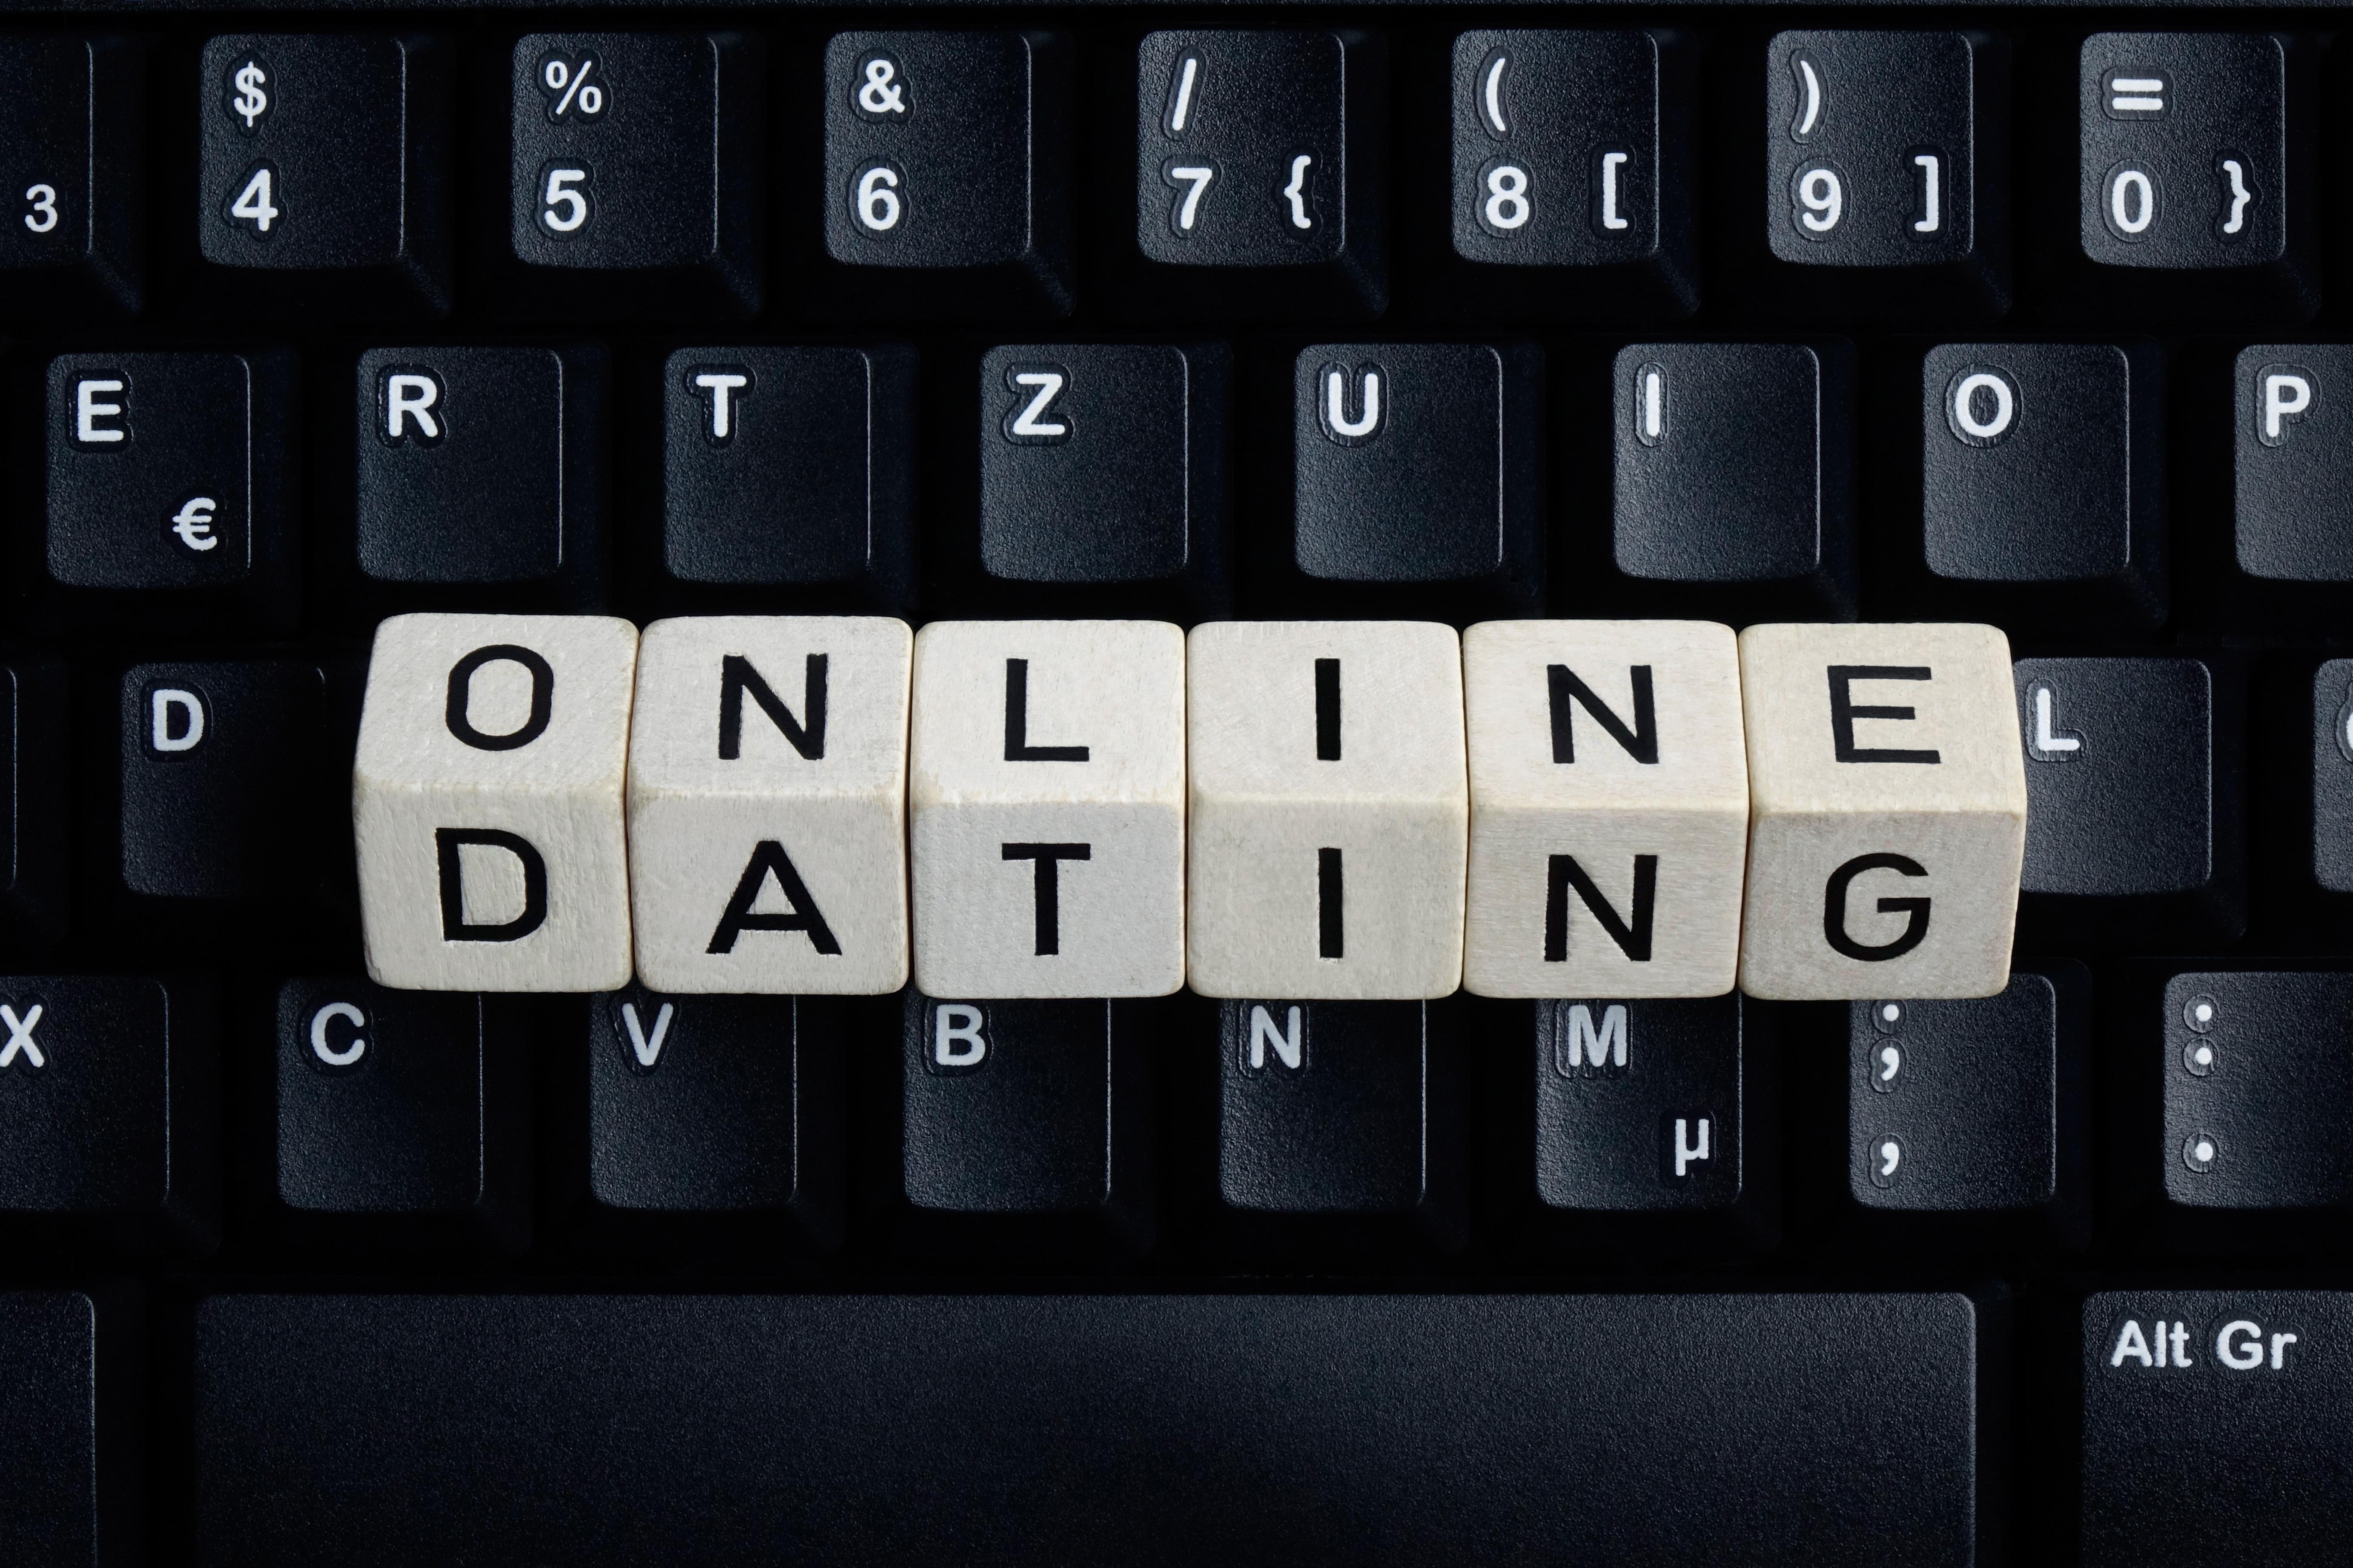 online dating Downsyndroom Inleiding op dating website